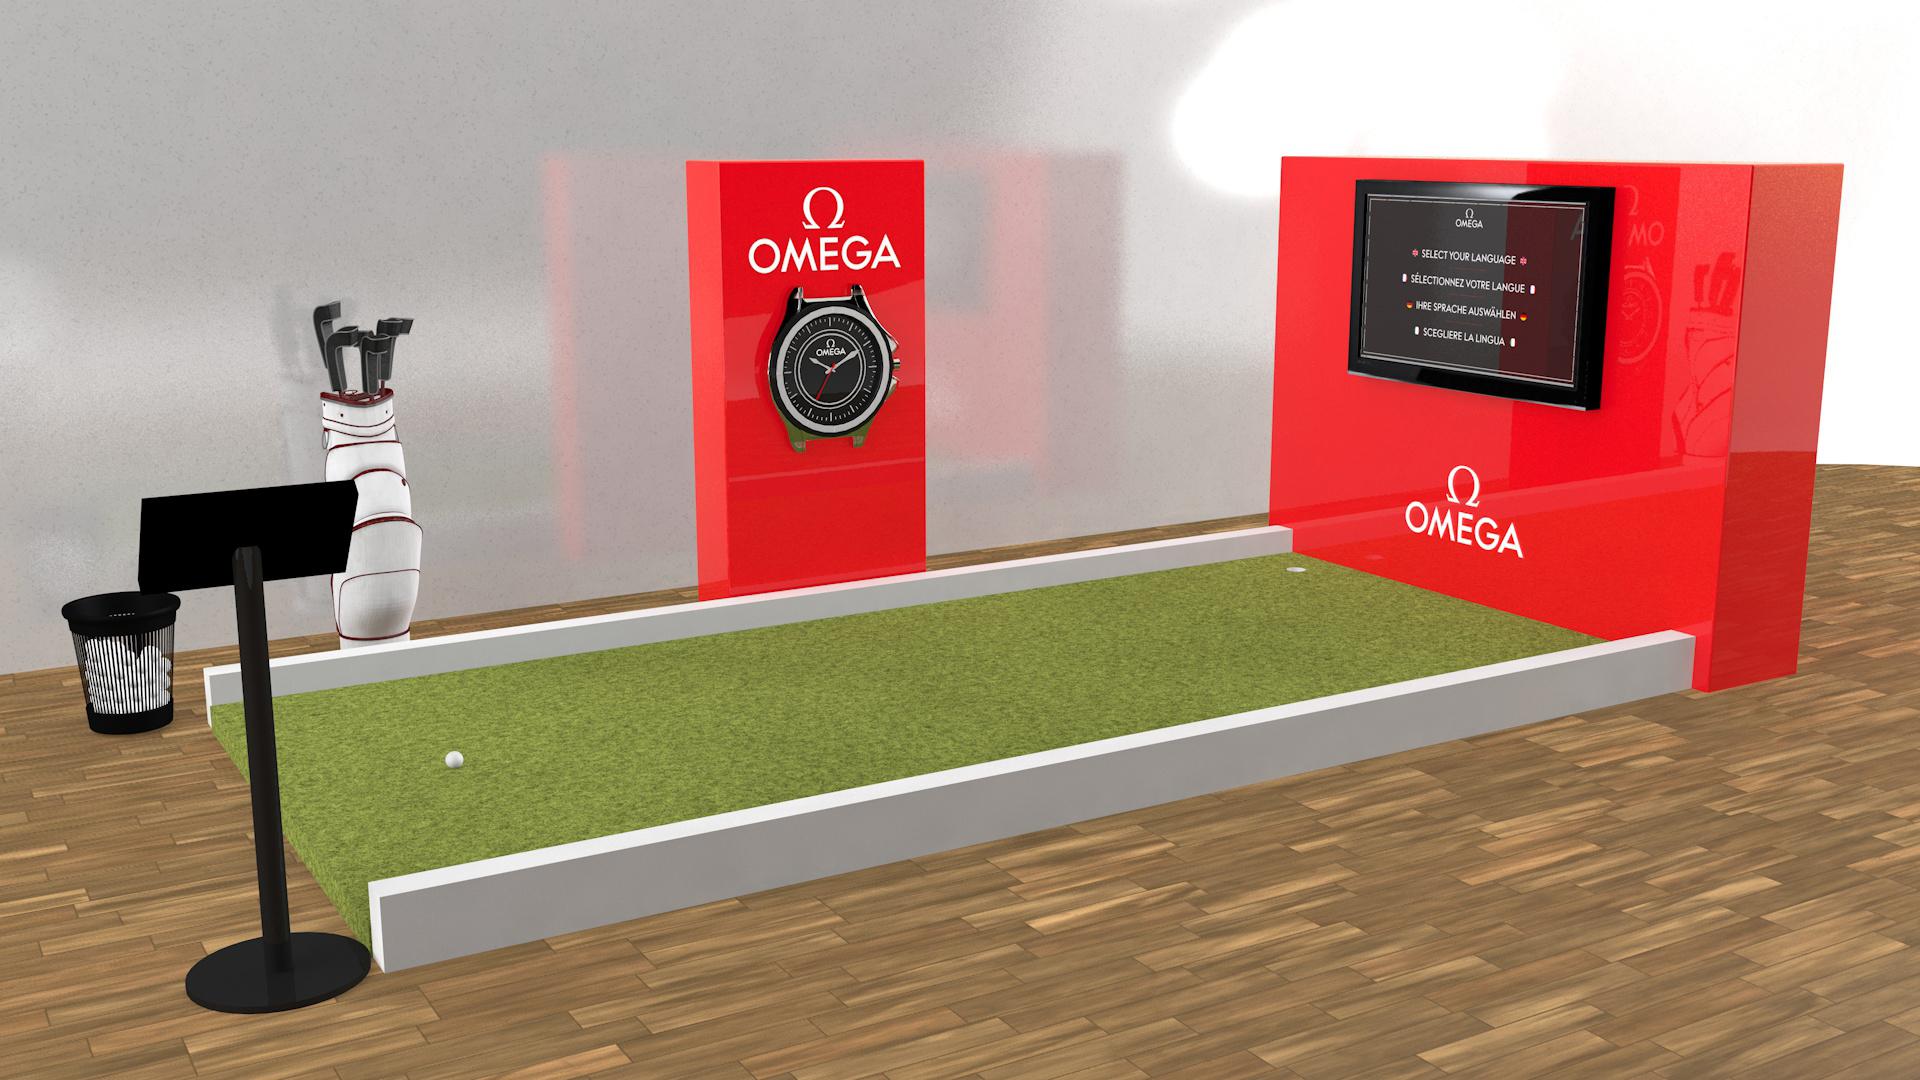 Omega Putting Application